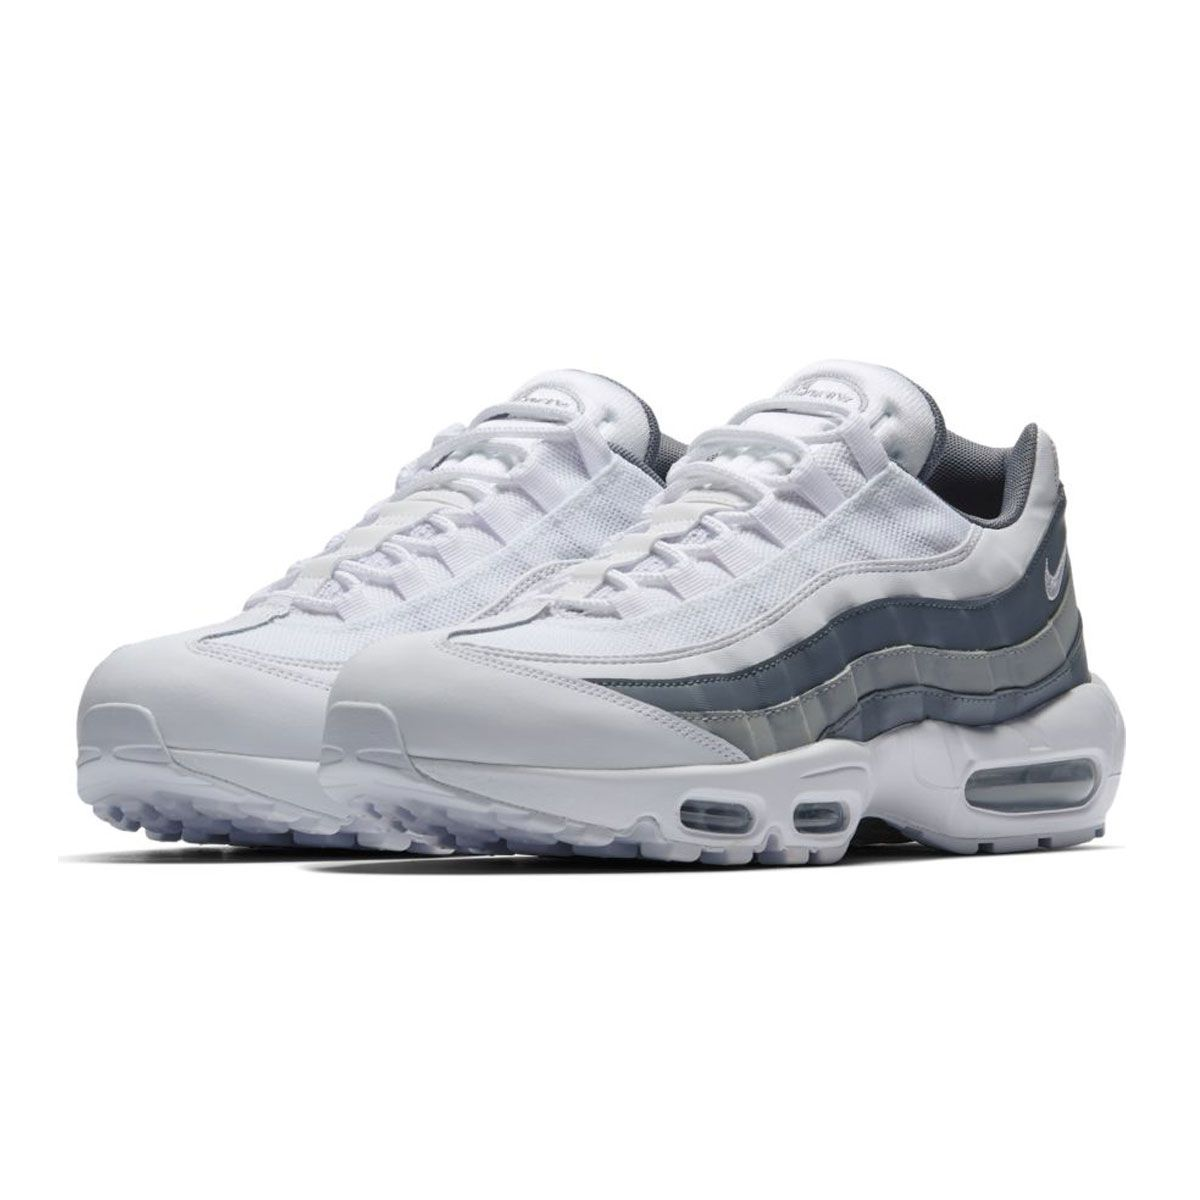 3f36d01439a8 air max 95 cool grey LeBron ...